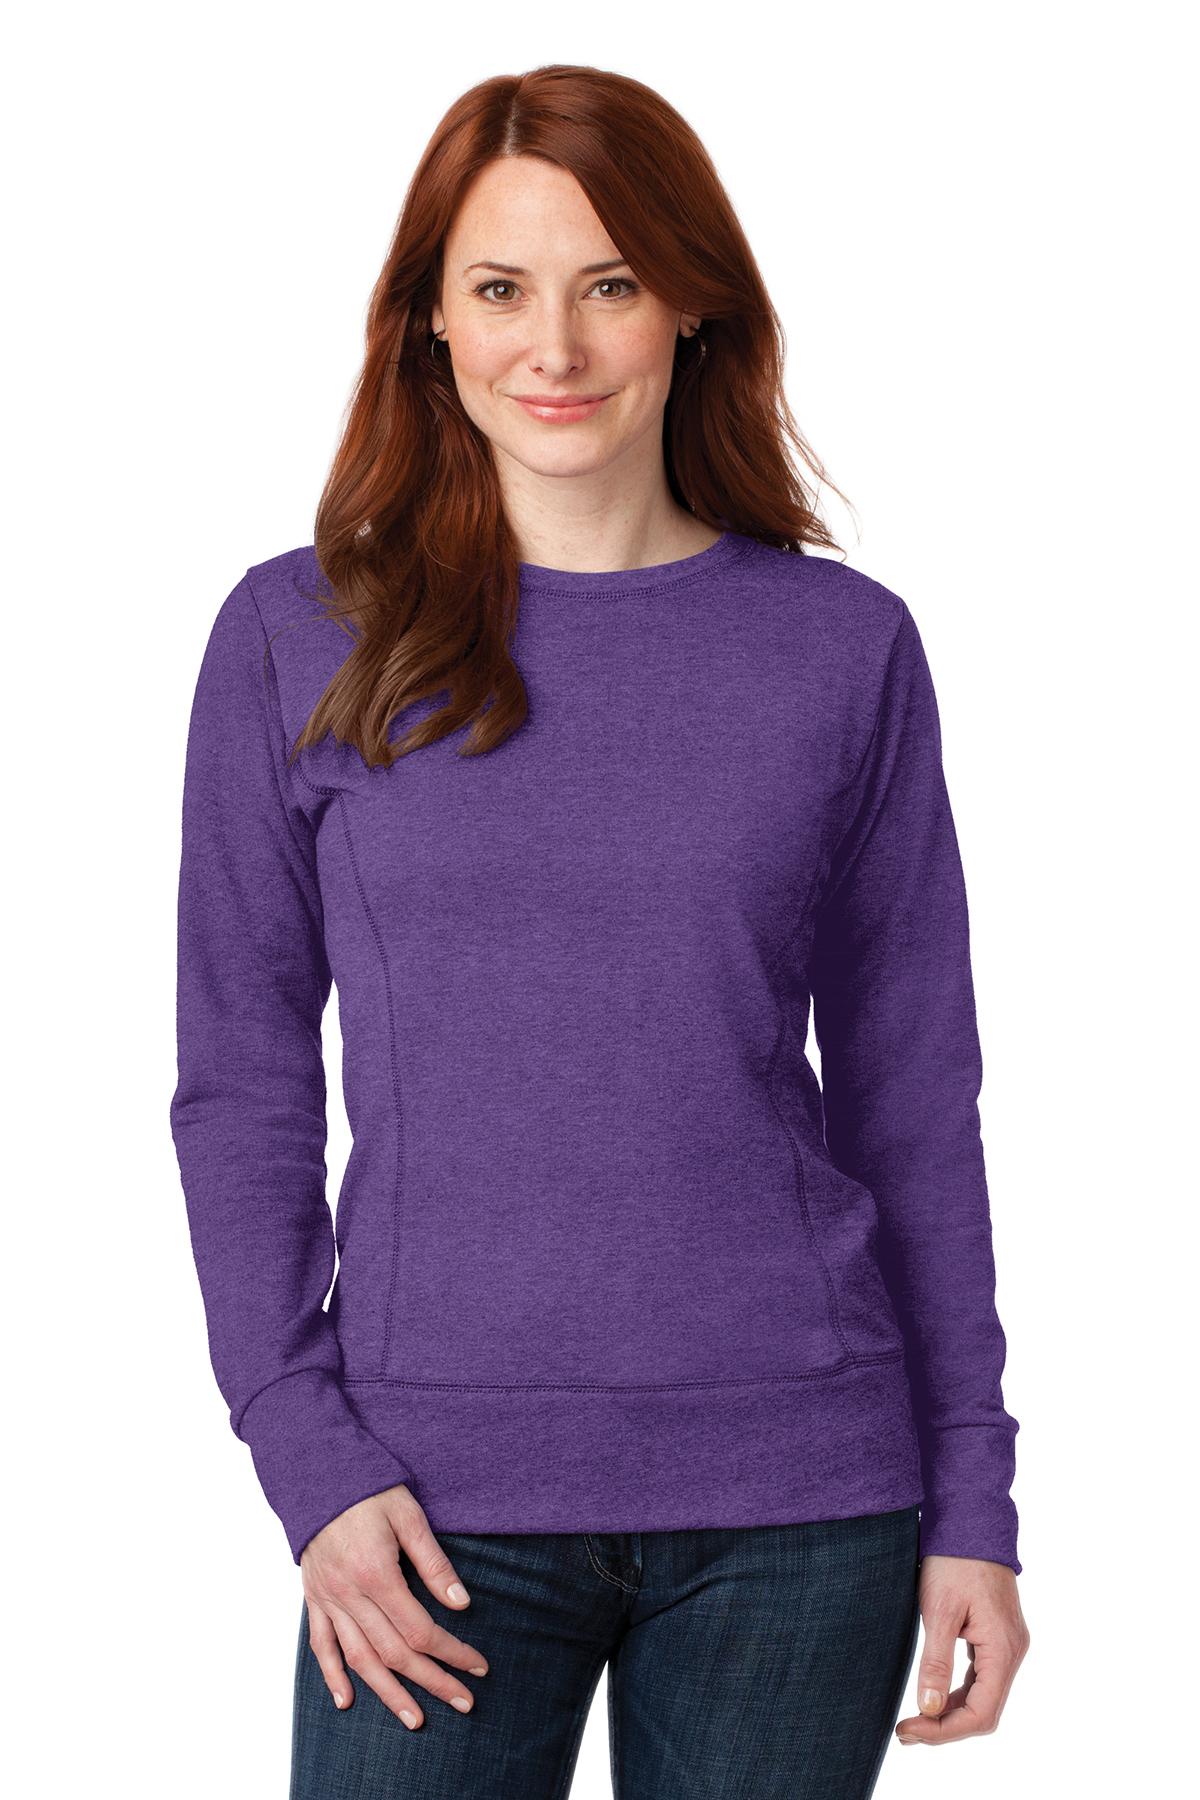 d7520f9e9fac Anvil® Ladies French Terry Crewneck Sweatshirt